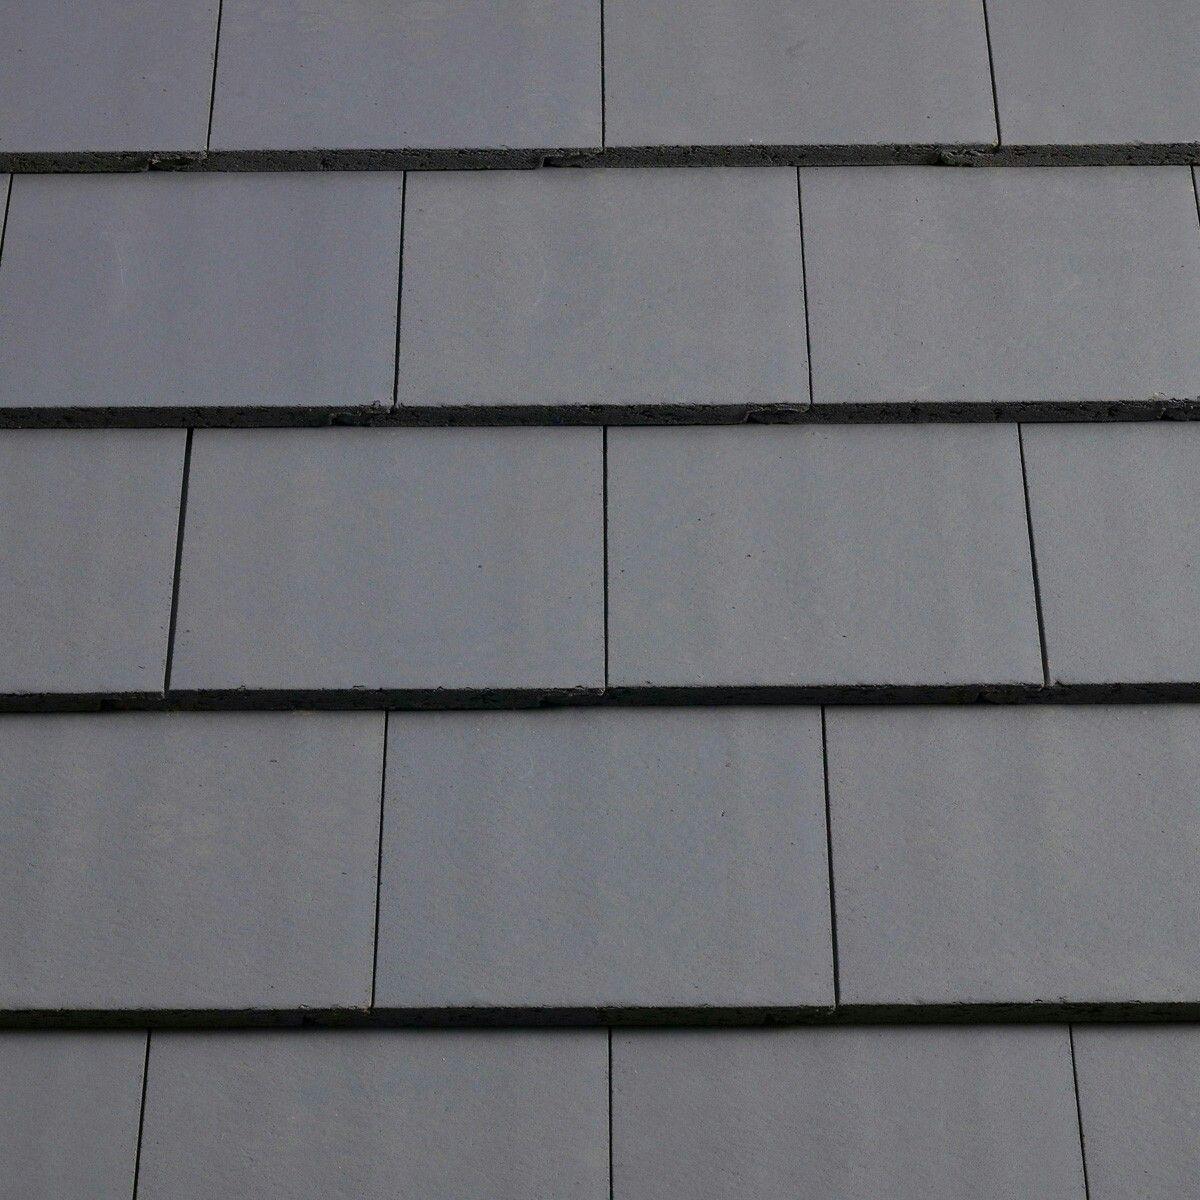 Grey Roof Tiles Concrete Roof Tiles Slate Roof Tiles Roof Tiles